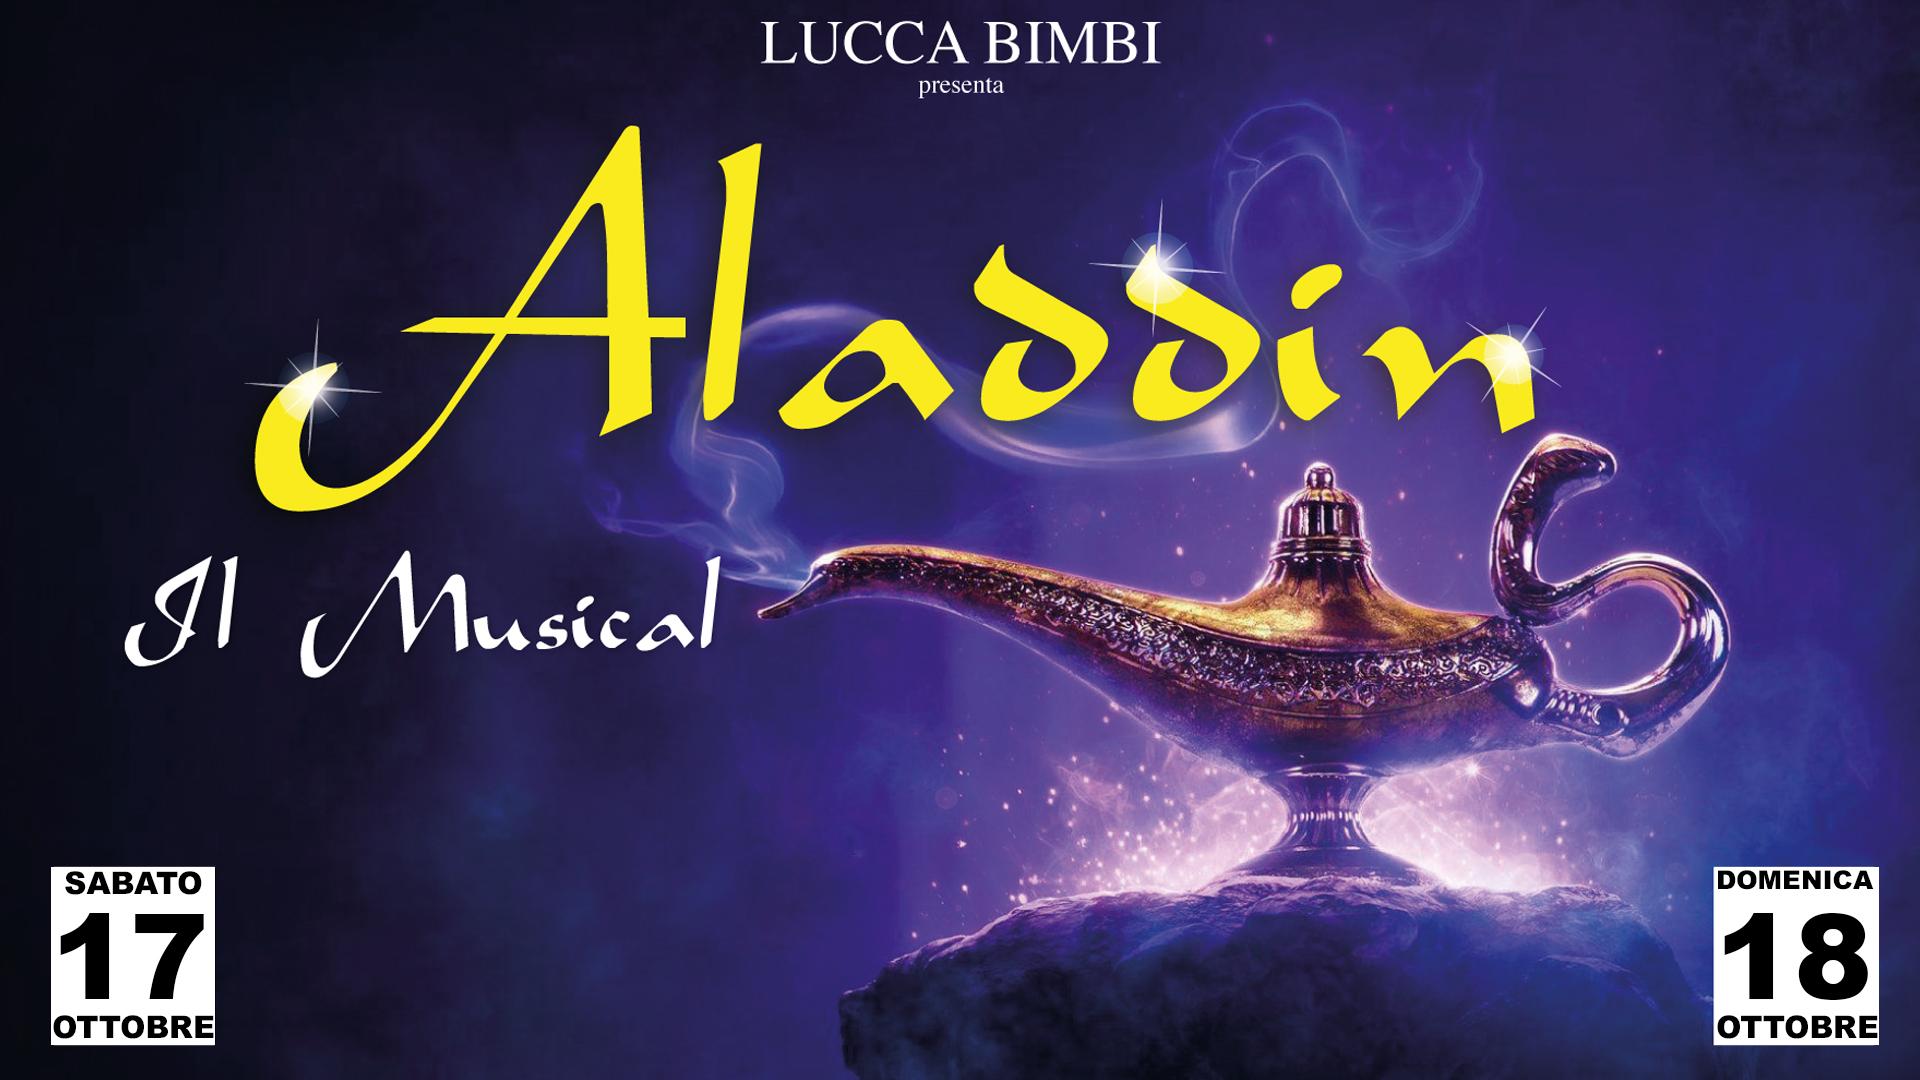 Lucca Bimbi 2020 Alladin